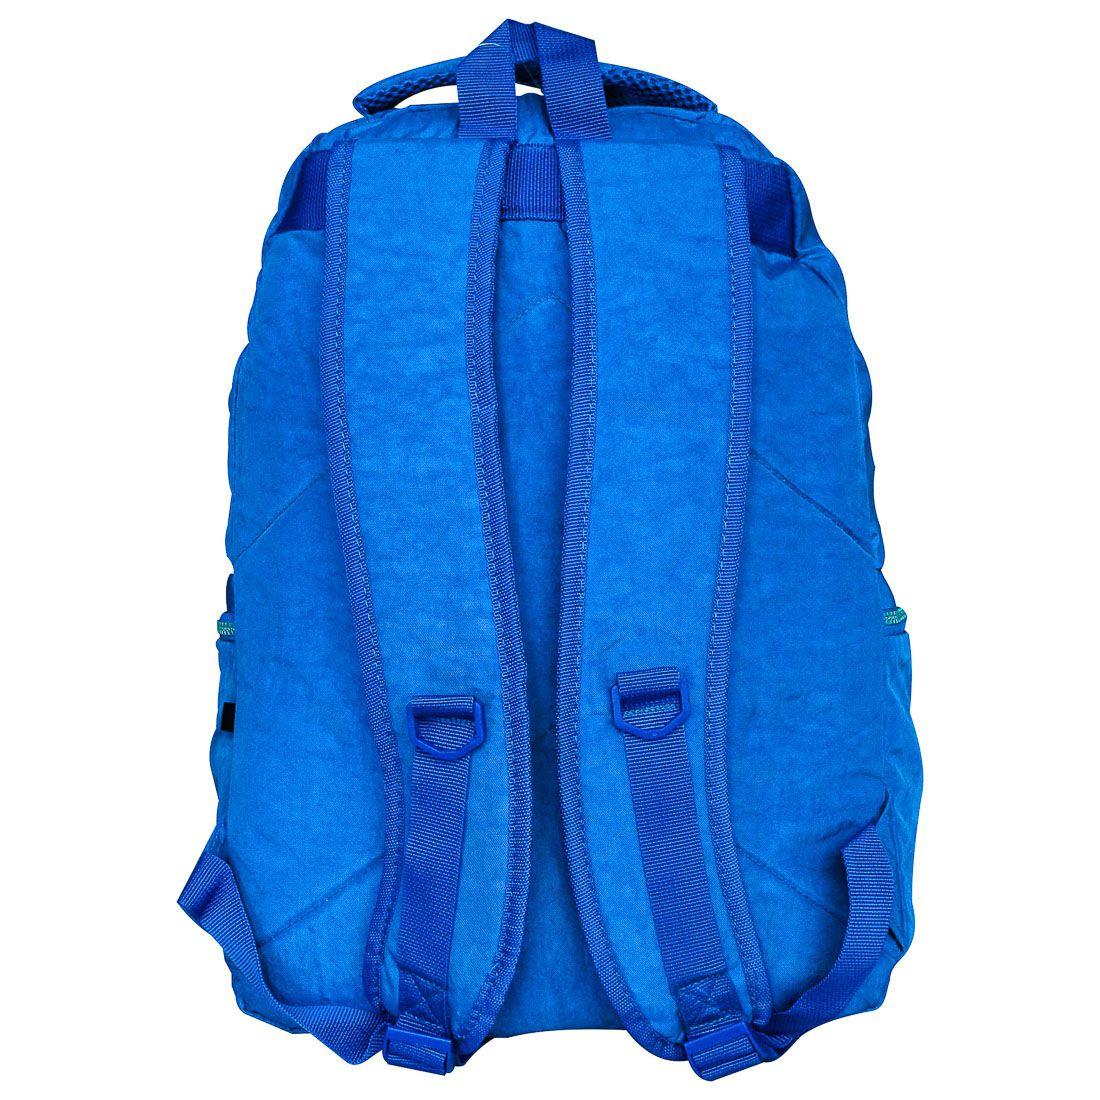 Mochila Escolar para Notebook Seanite Azul ML14008